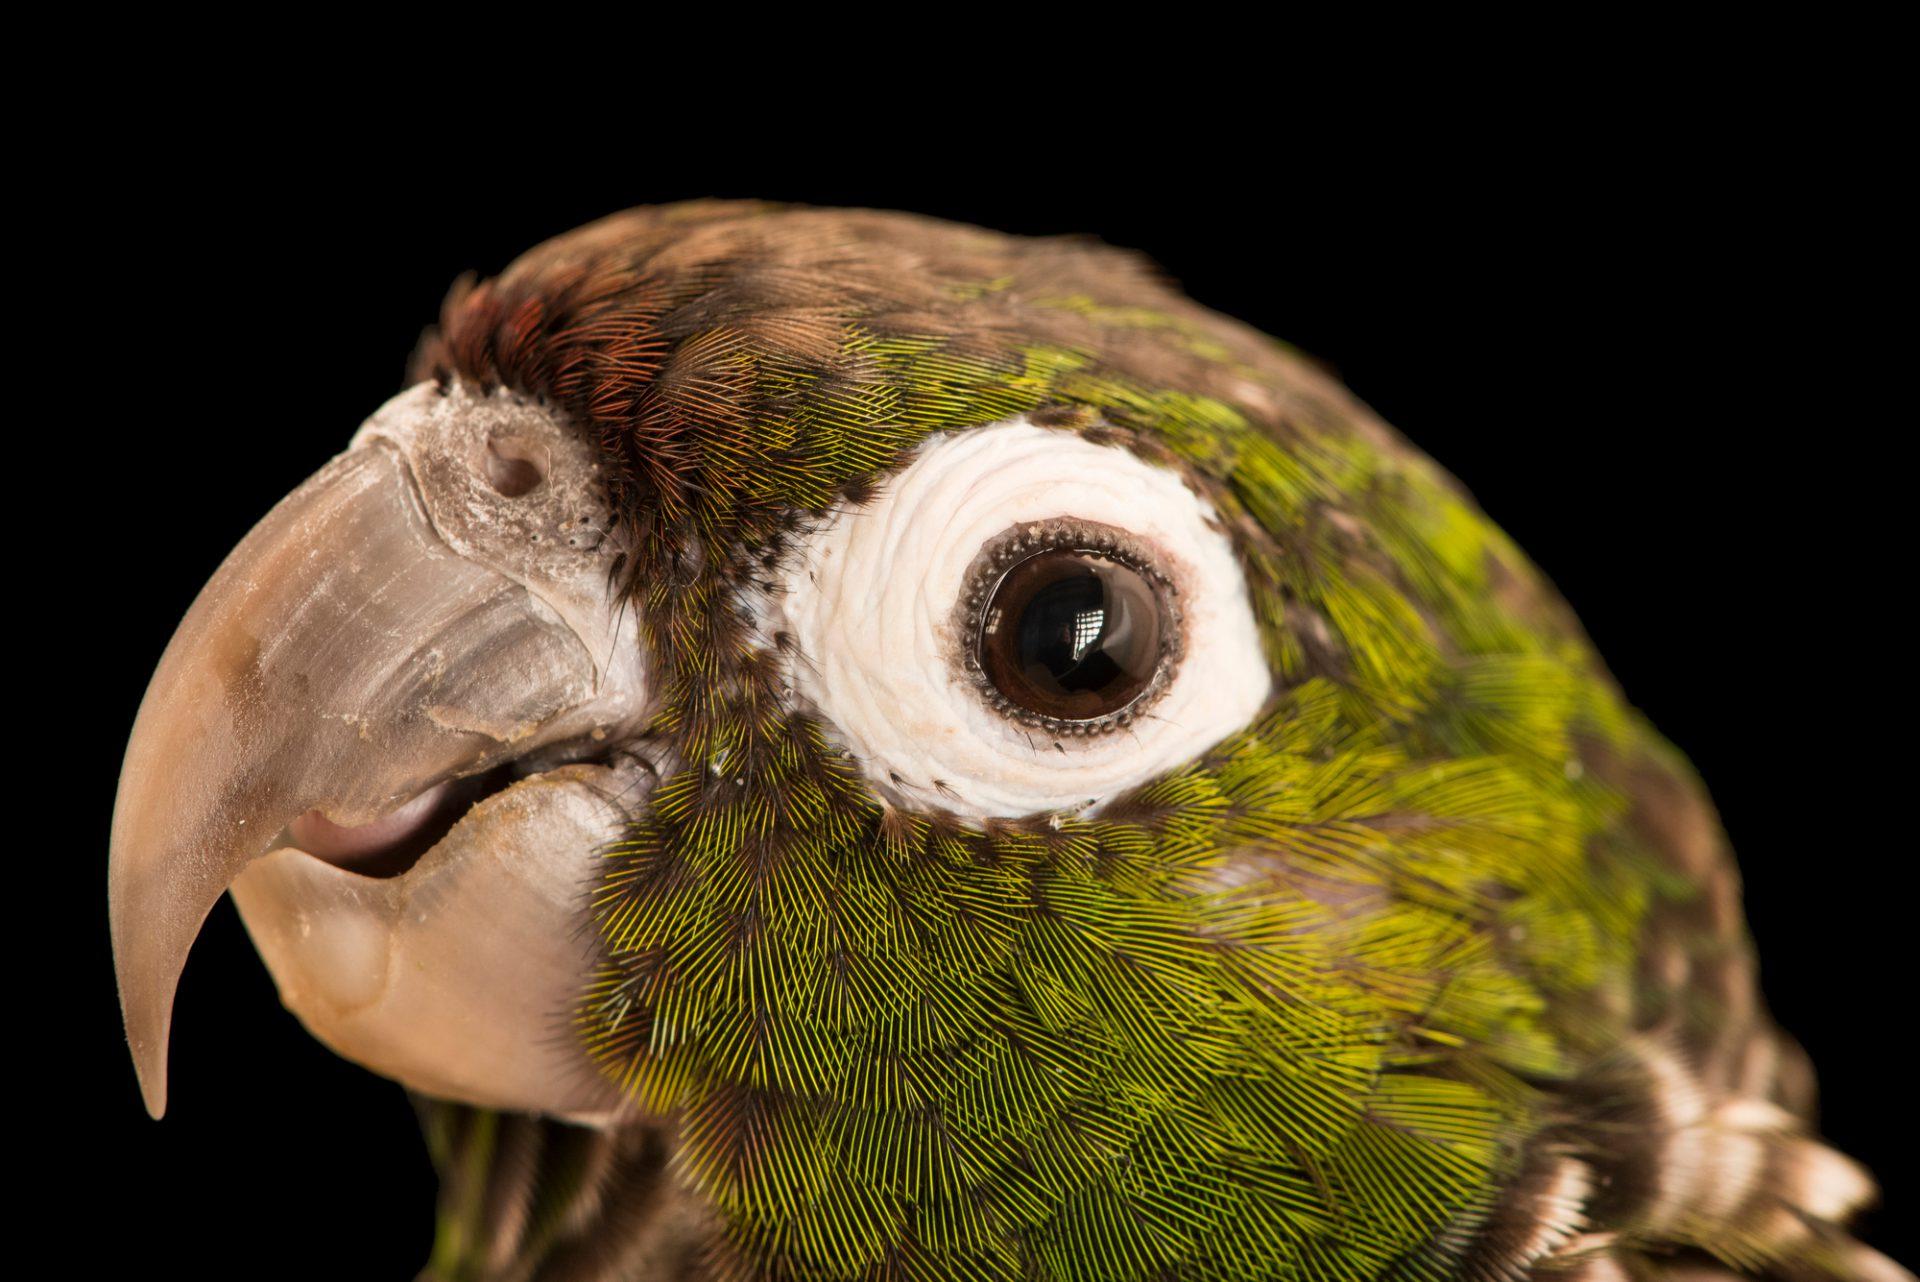 Photo: Maroon tailed parakeet (Pyrrhura melanura souancei) at Loro Parque Fundacion.